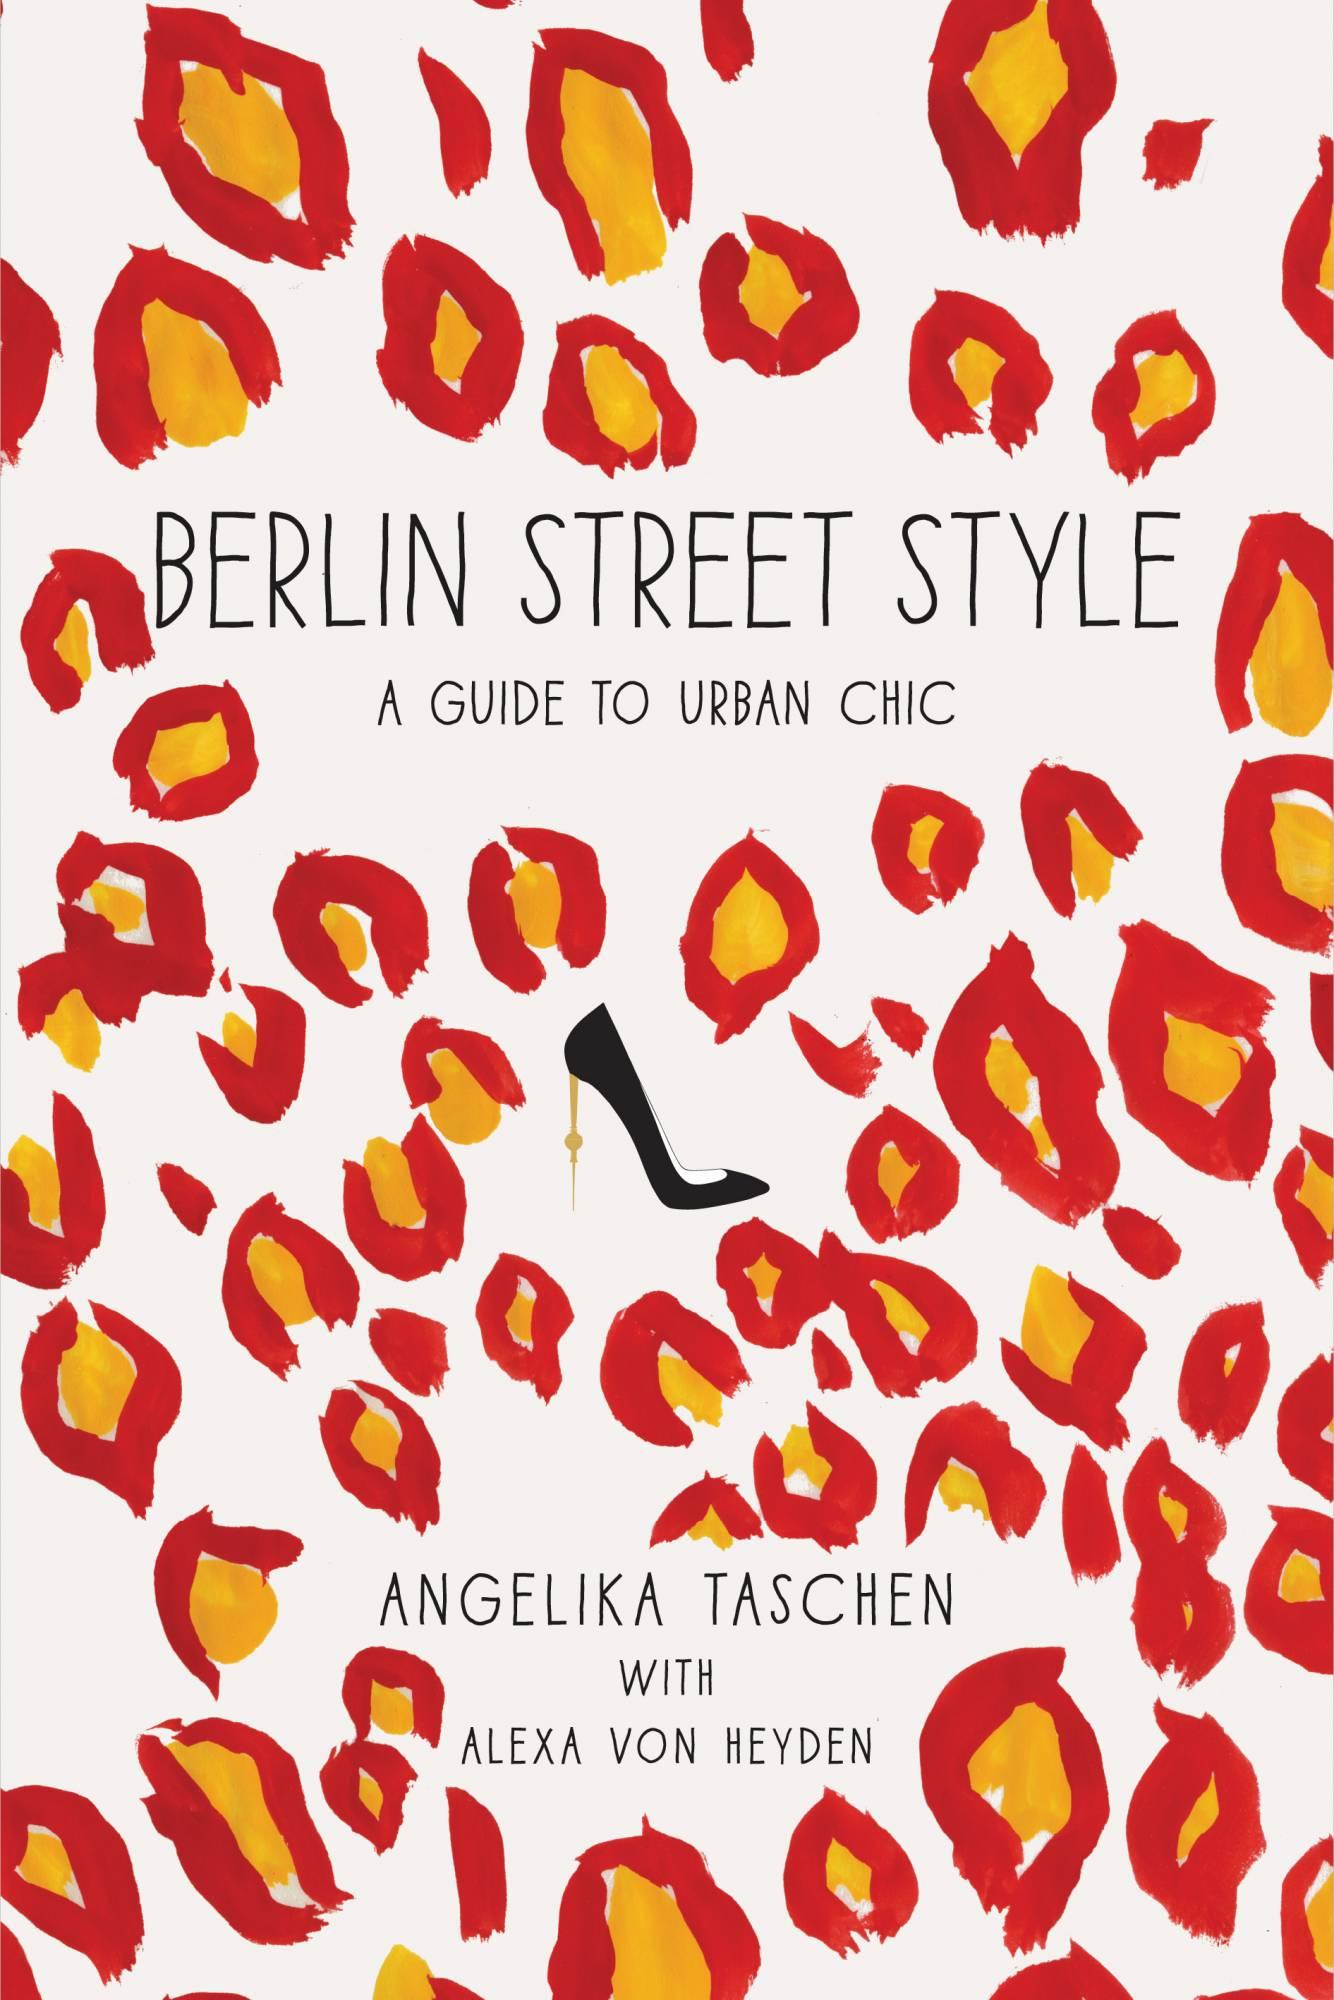 berlin street style book